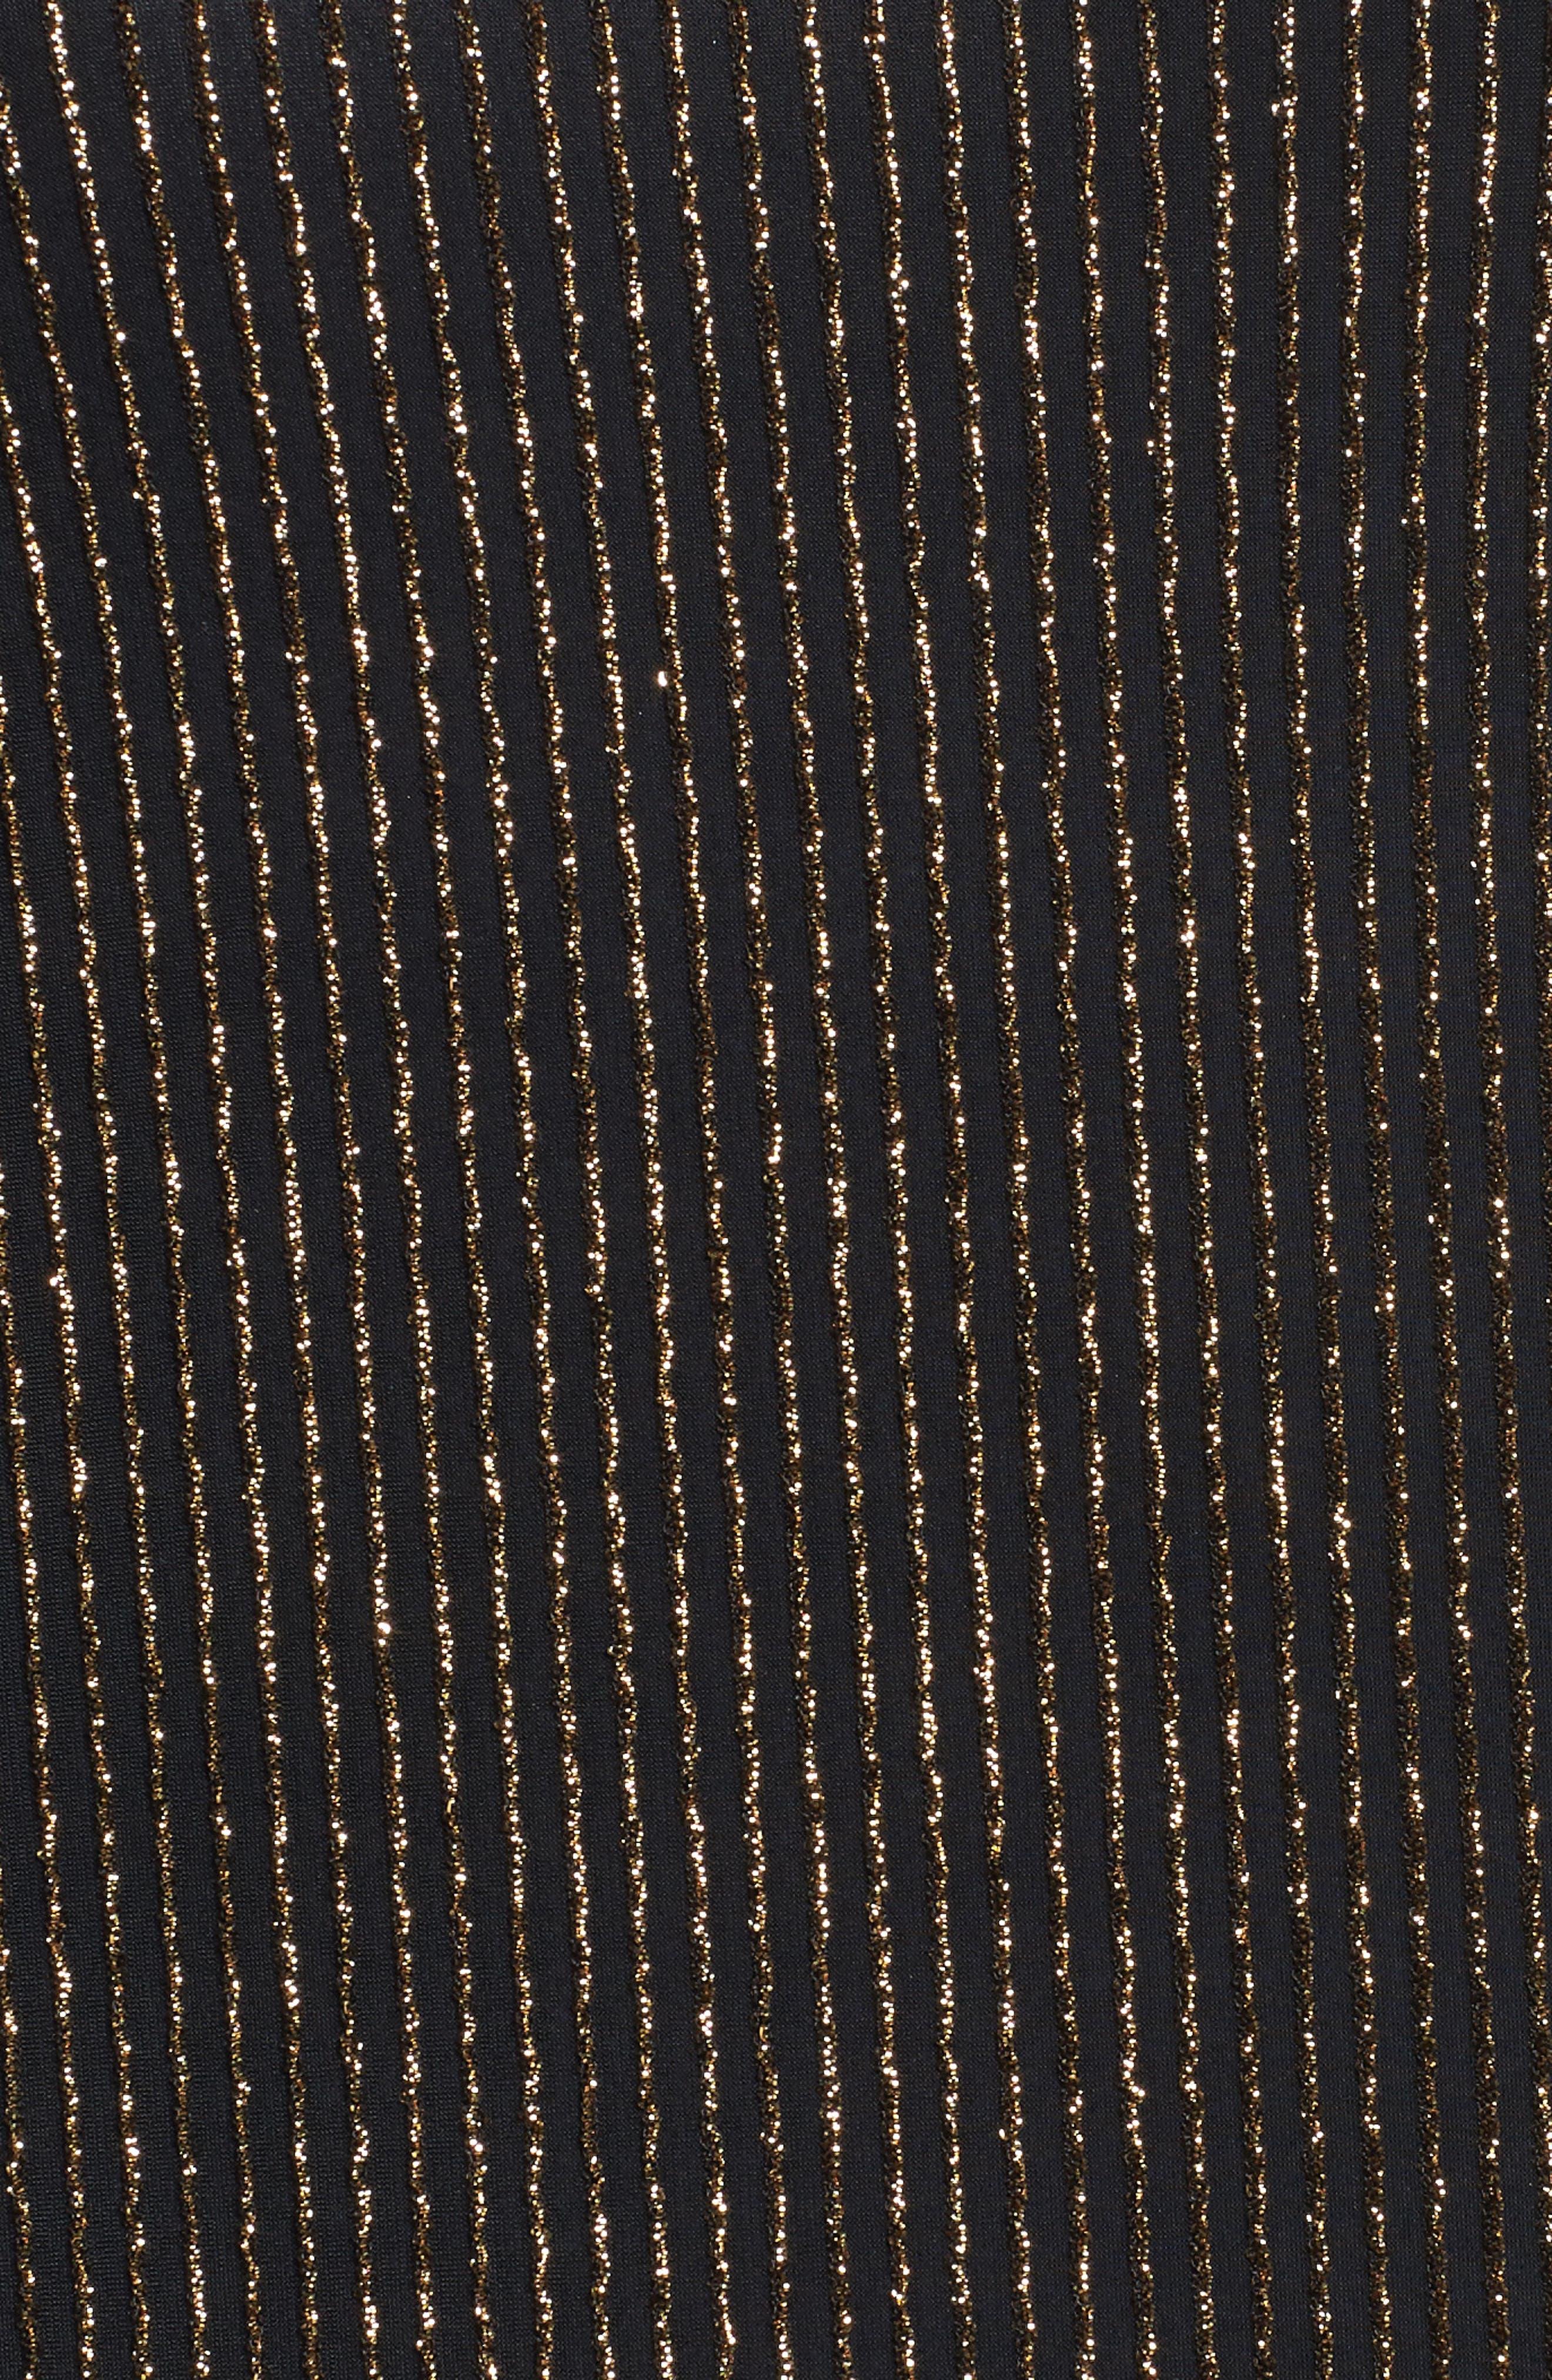 Sparkle Cold Shoulder Top,                             Alternate thumbnail 5, color,                             Black/ Gold